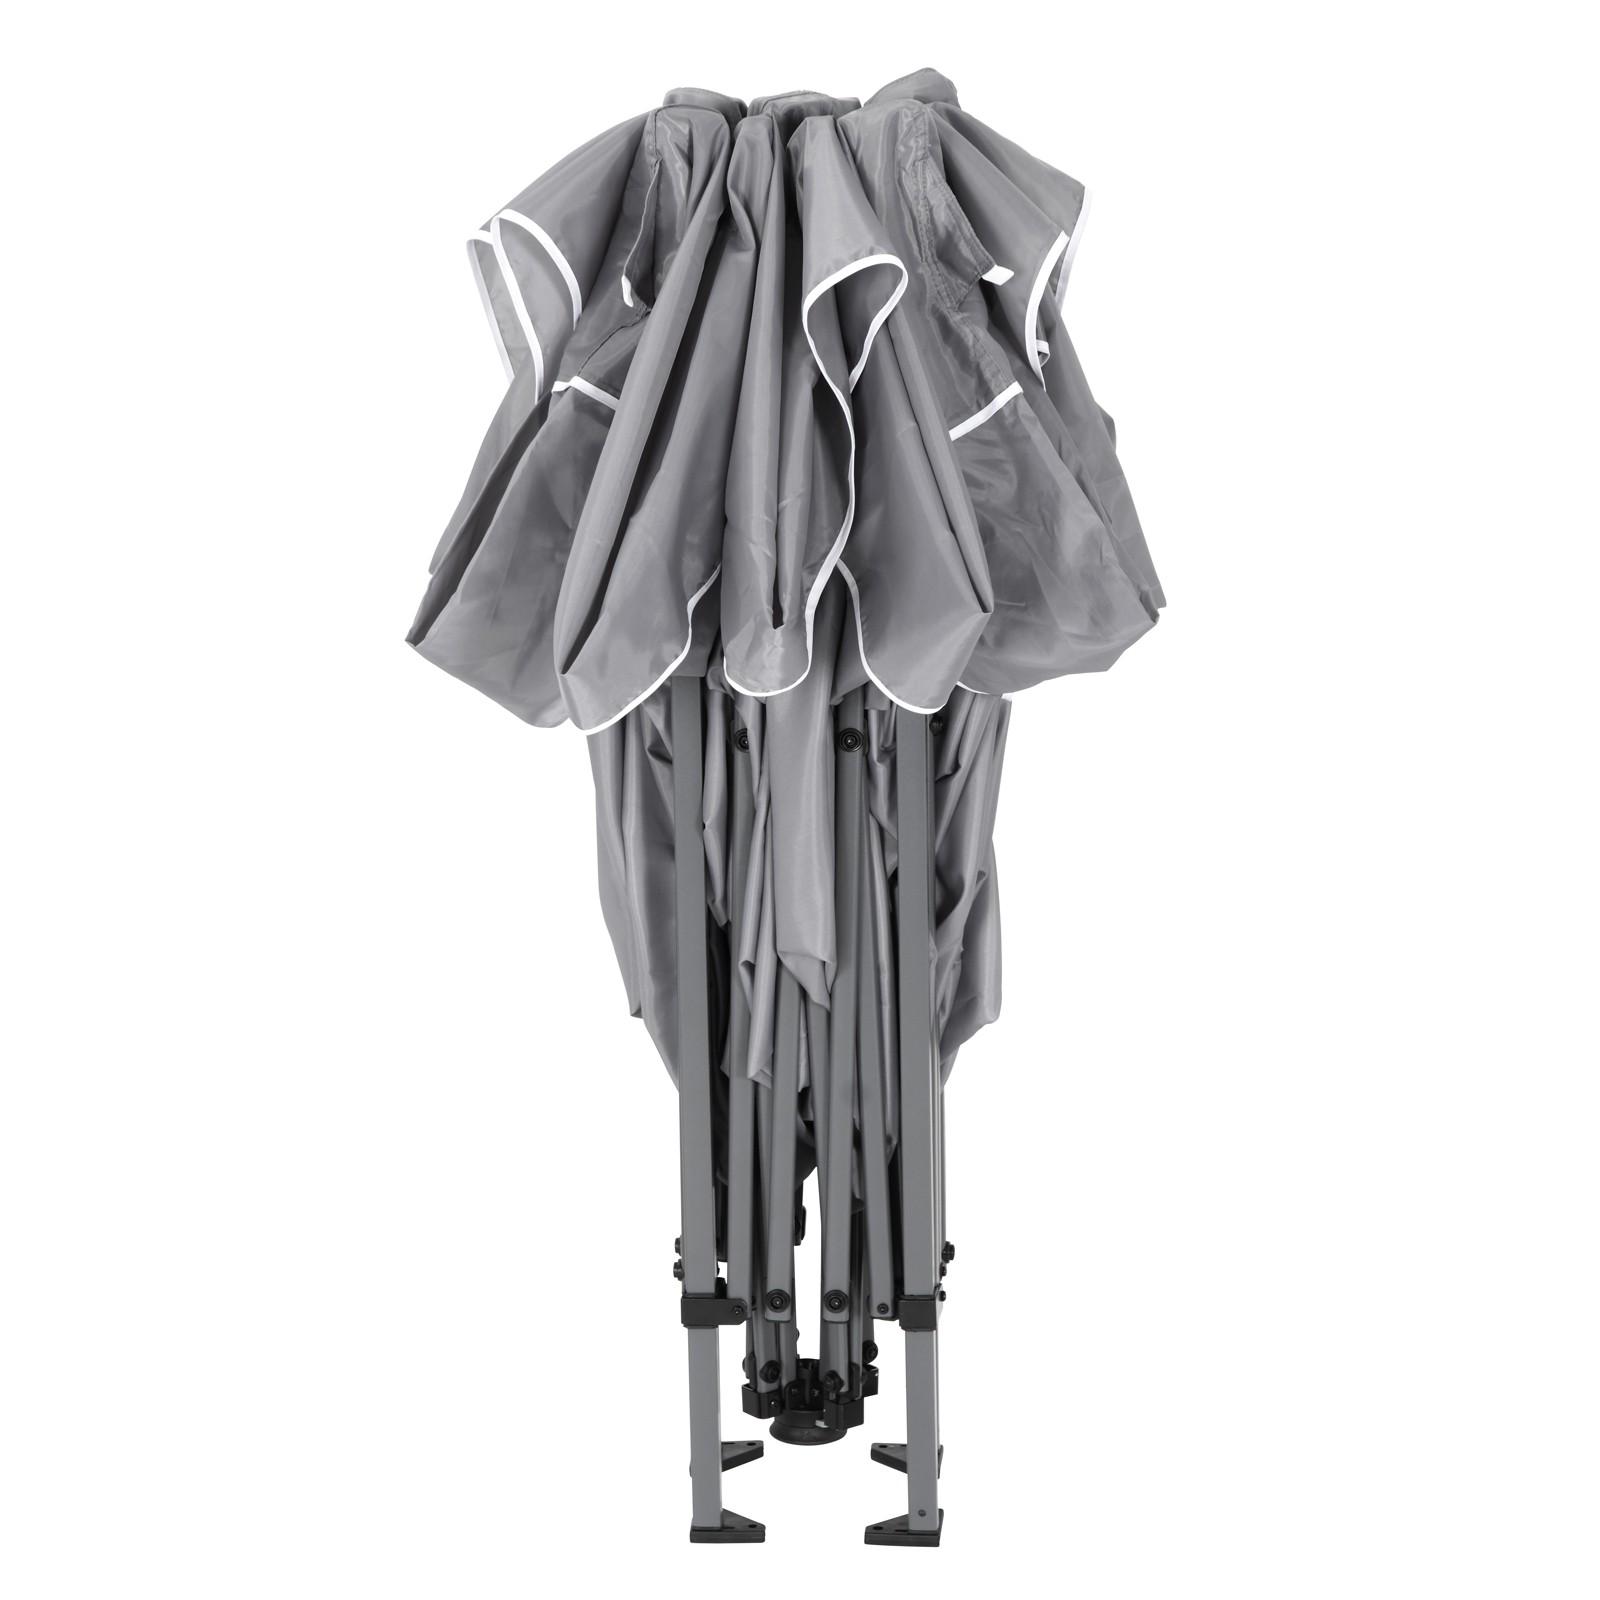 tepro faltpavillon pavillon 3x3 gartenpavillon belize grau partyzelt festzelt 4011964055025 ebay. Black Bedroom Furniture Sets. Home Design Ideas